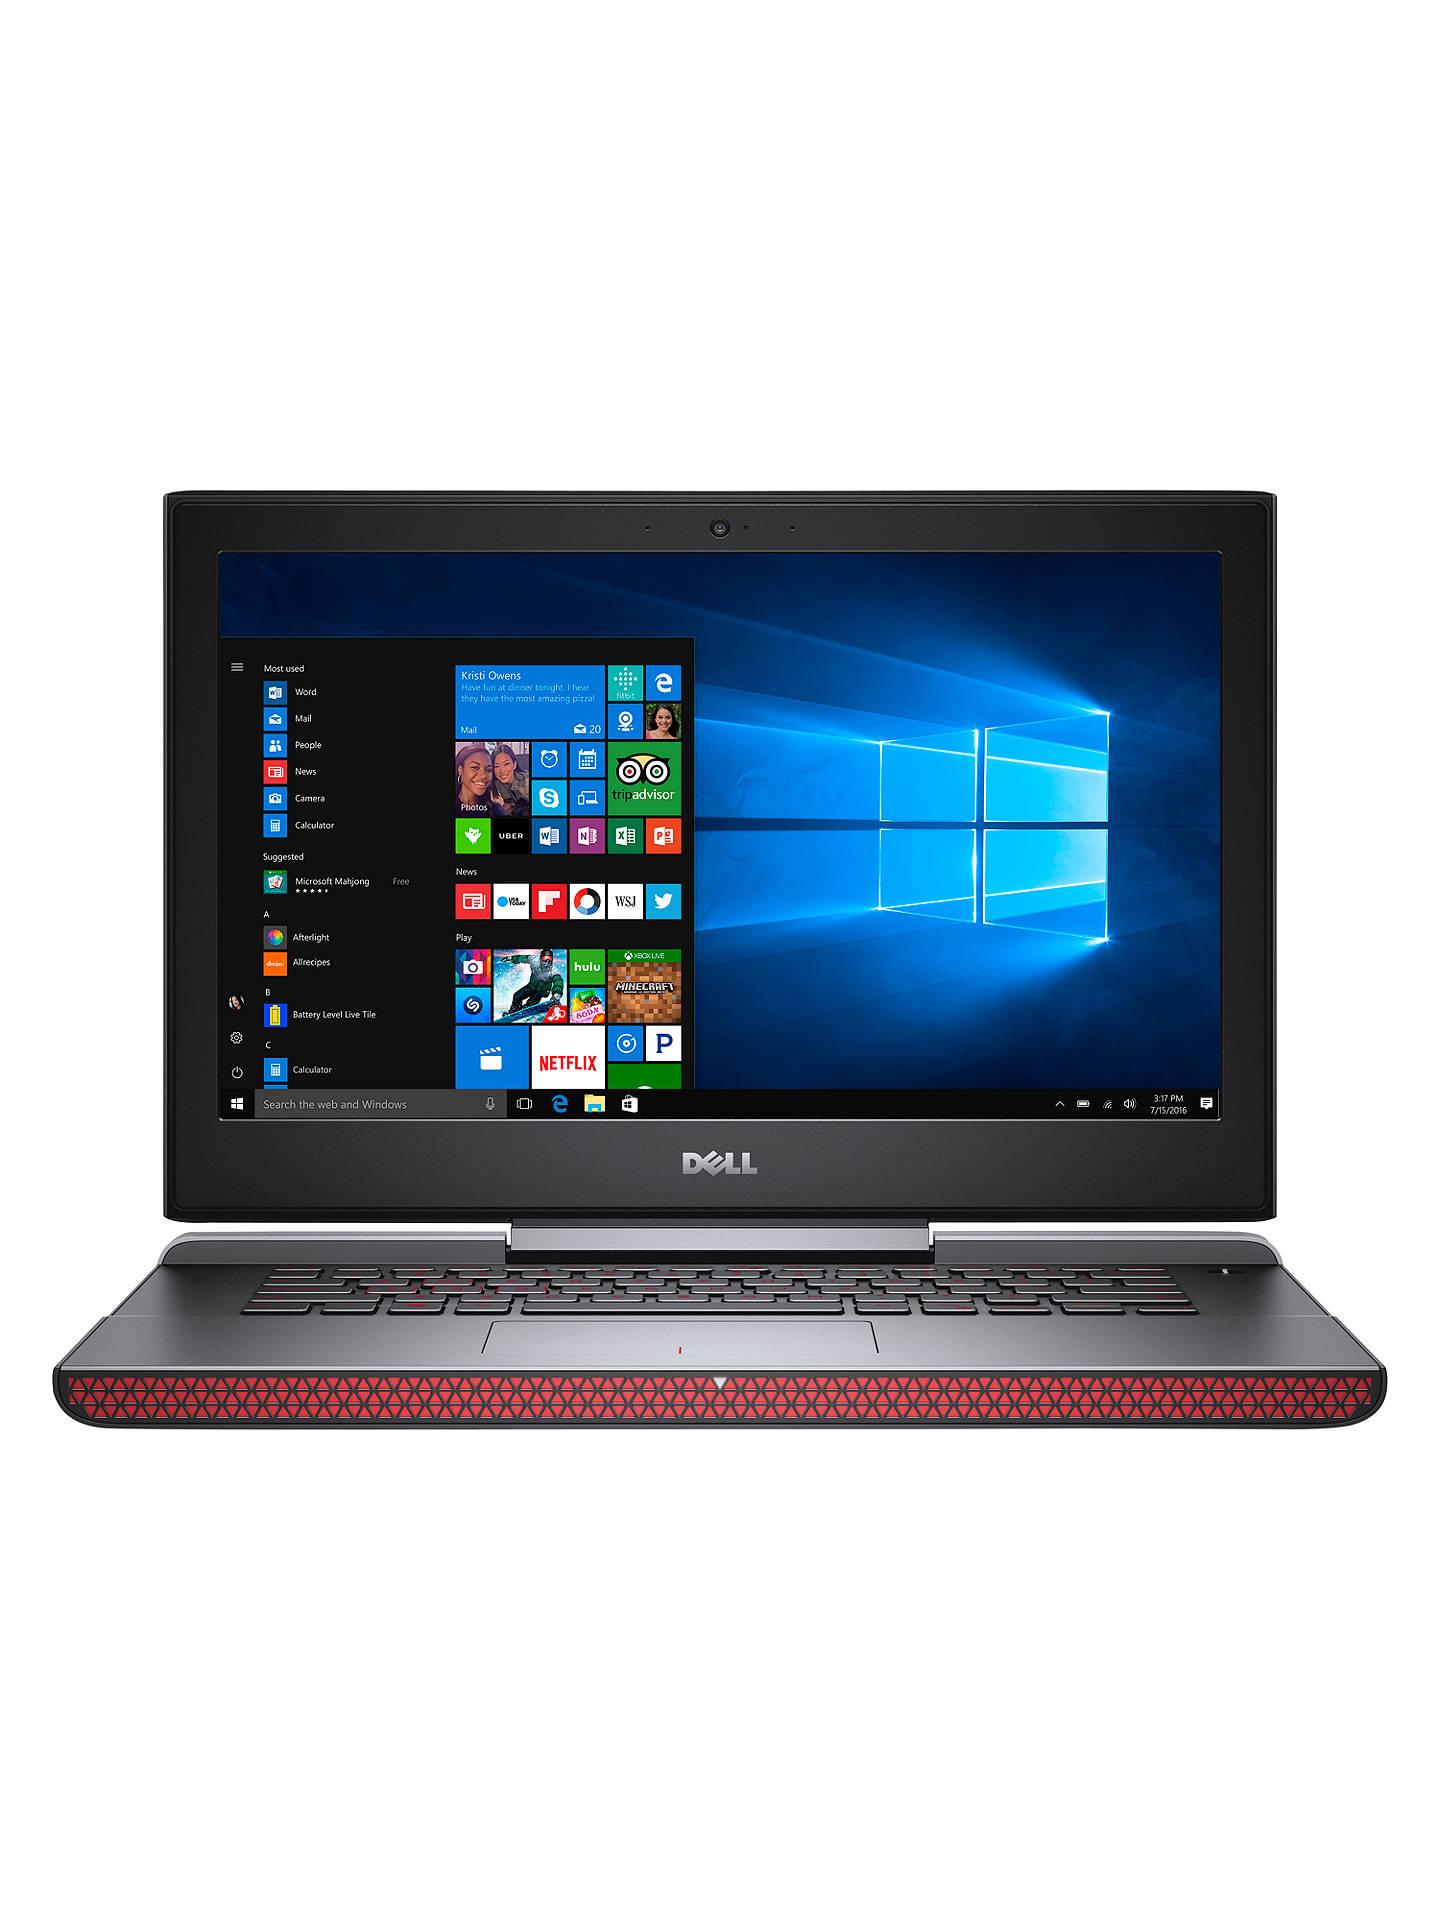 Dell Inspiron 15 7000 Gaming Laptop, Intel Core i7, 16GB RAM